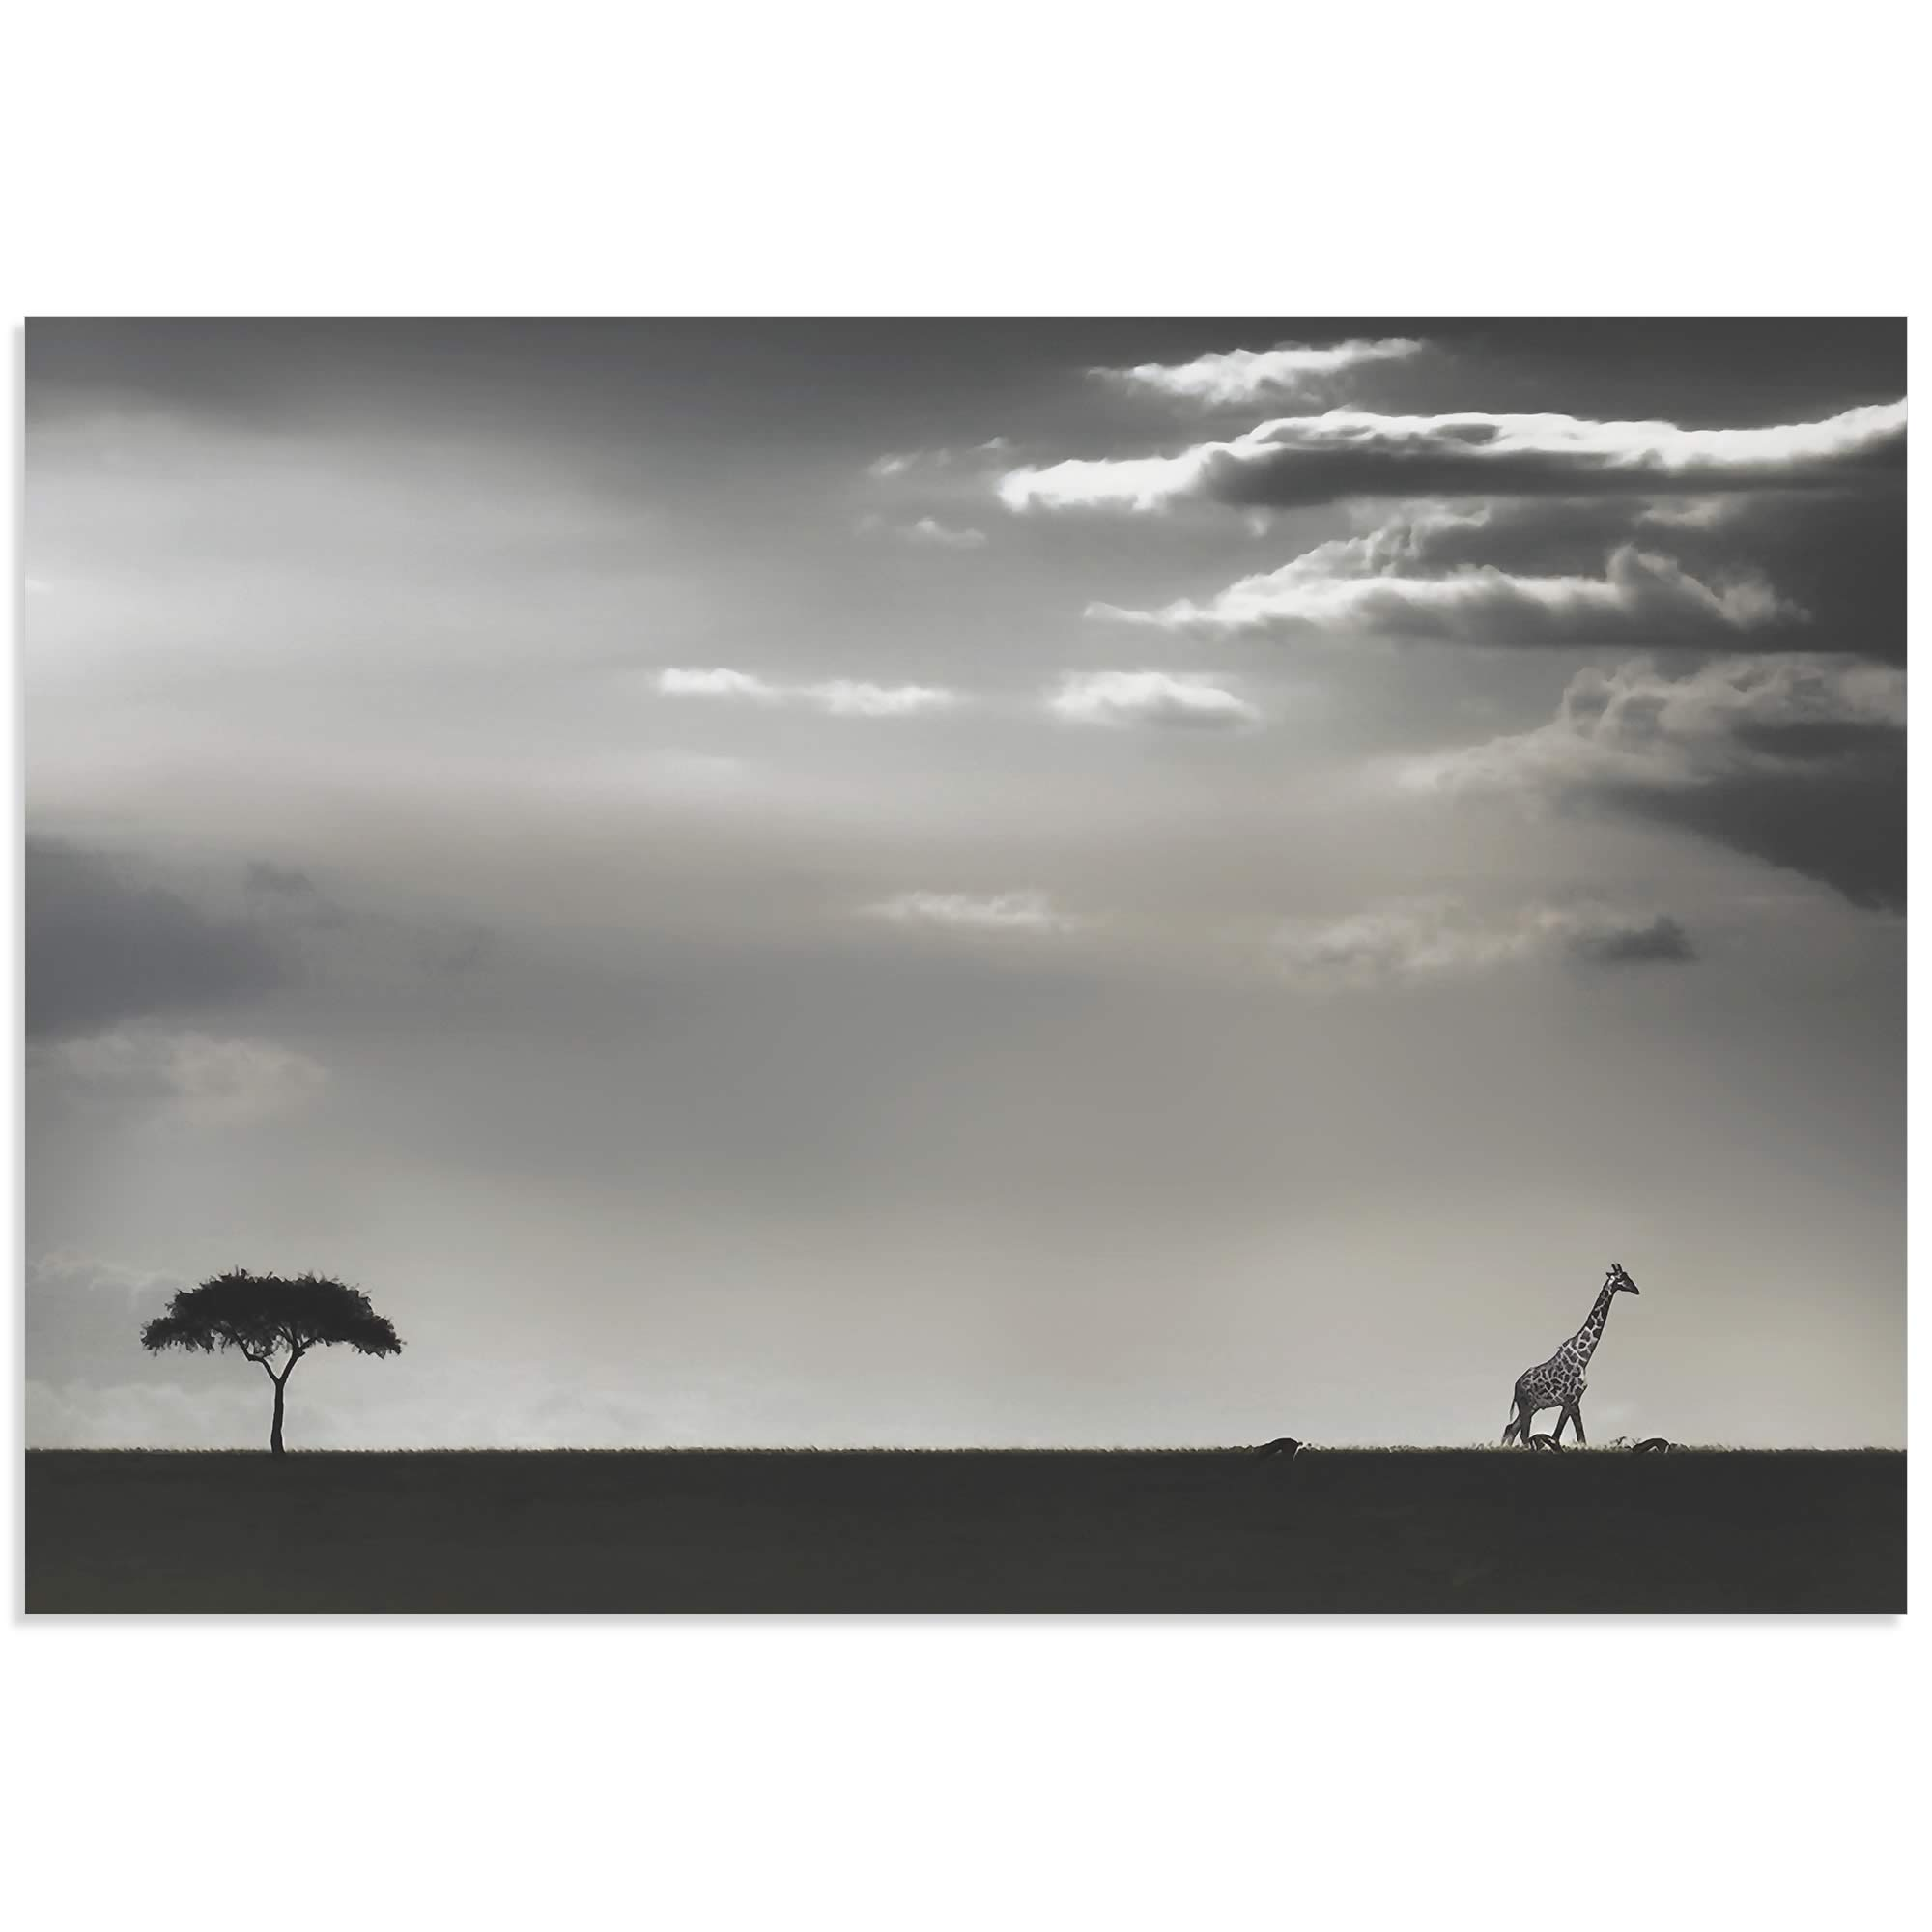 Giraffe on the Horizon by Piet Flour - Giraffe Wall Art on Metal or Acrylic